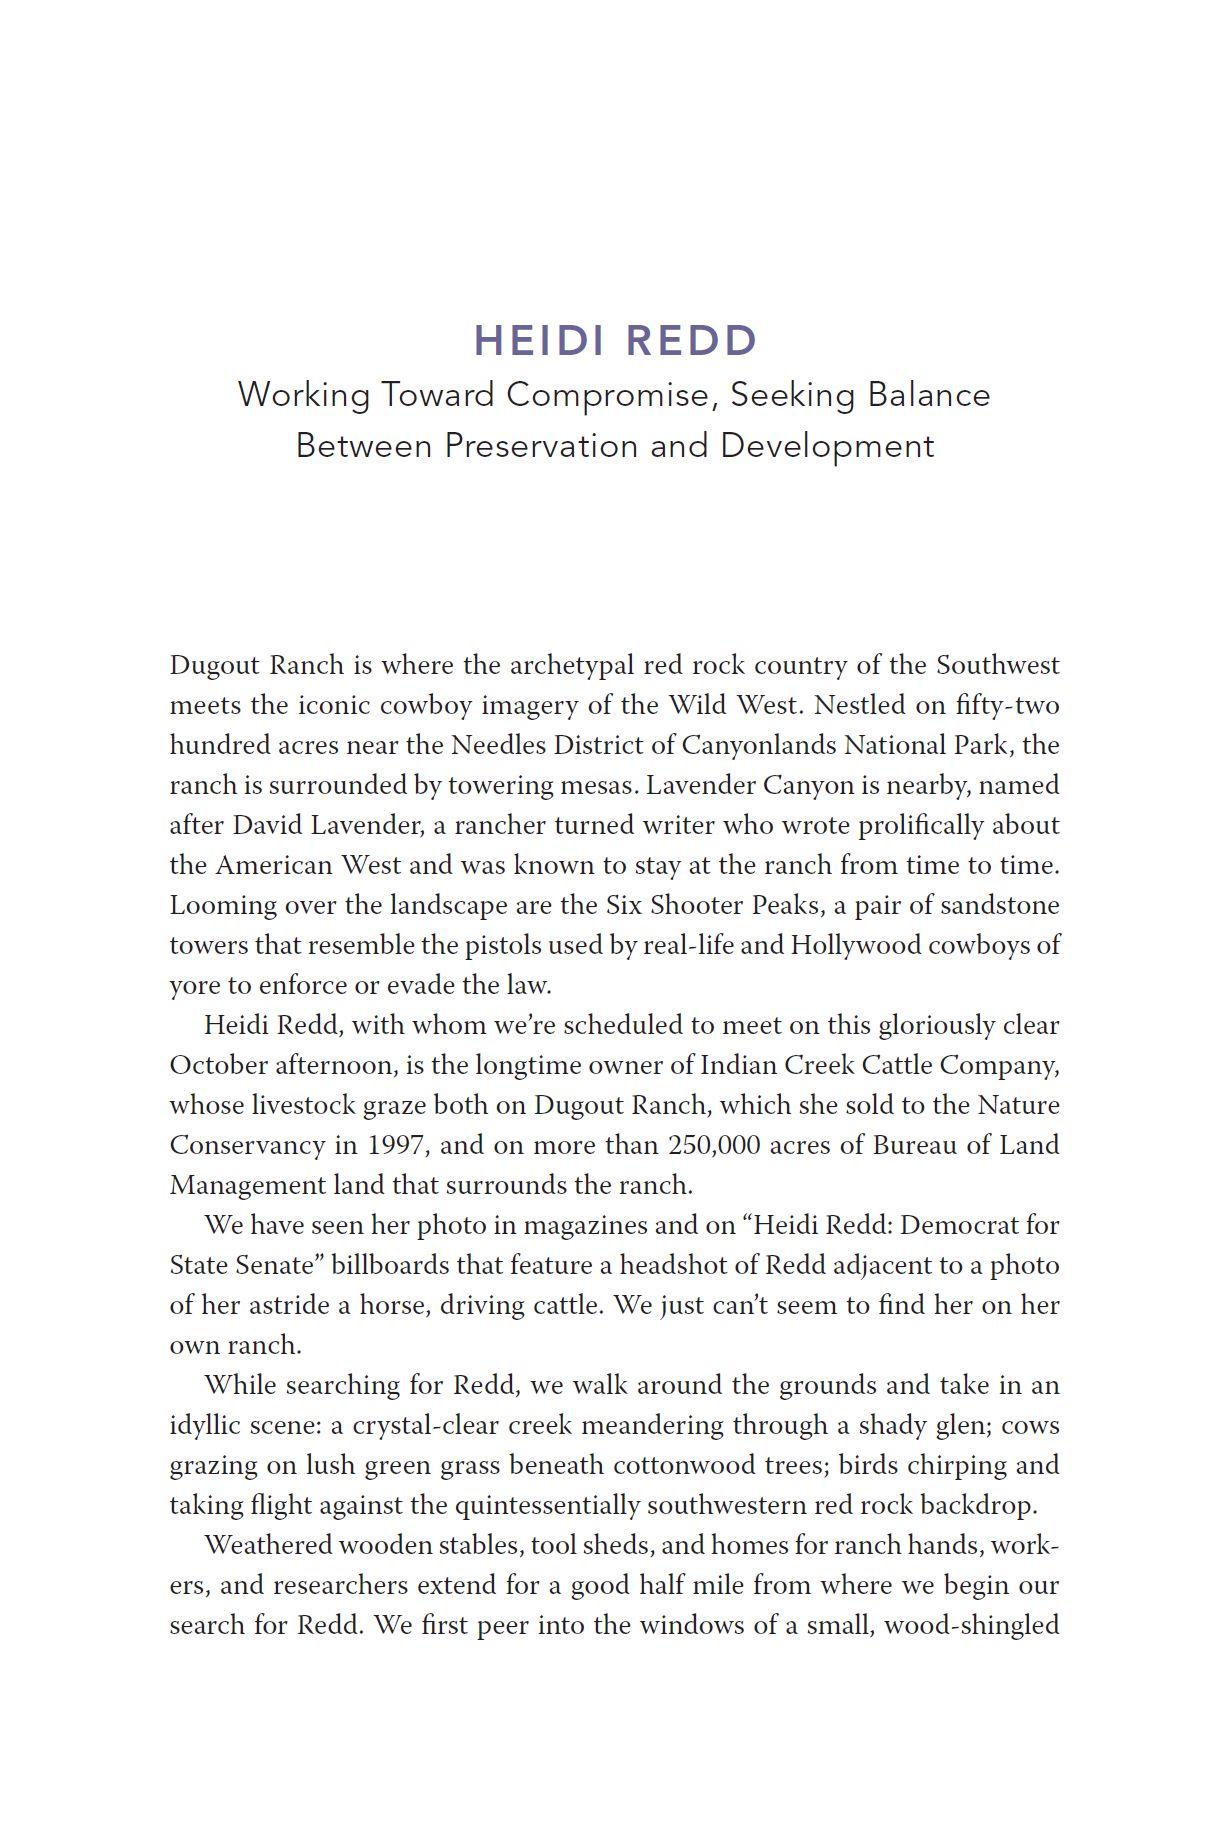 Heidi Redd p1.jpg